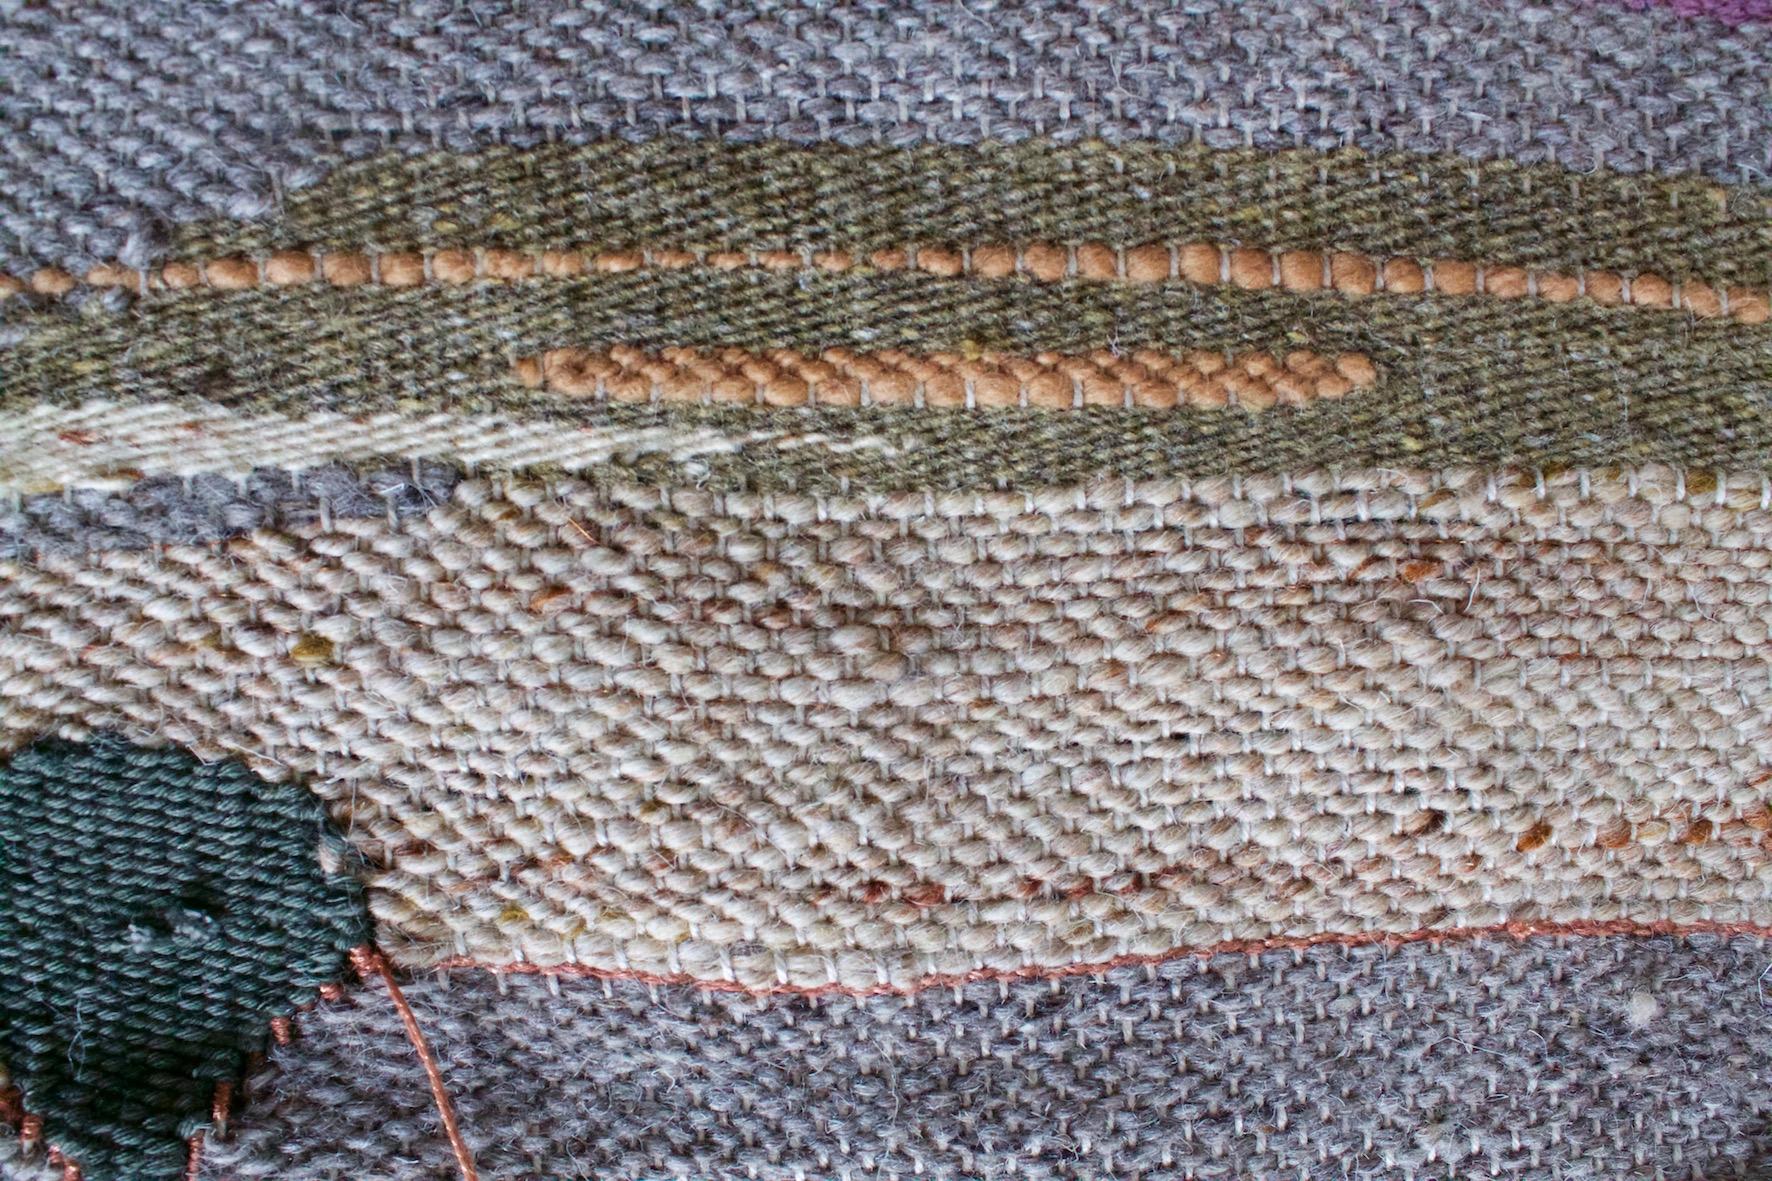 Nyssamtextiles Rug sample plain weave